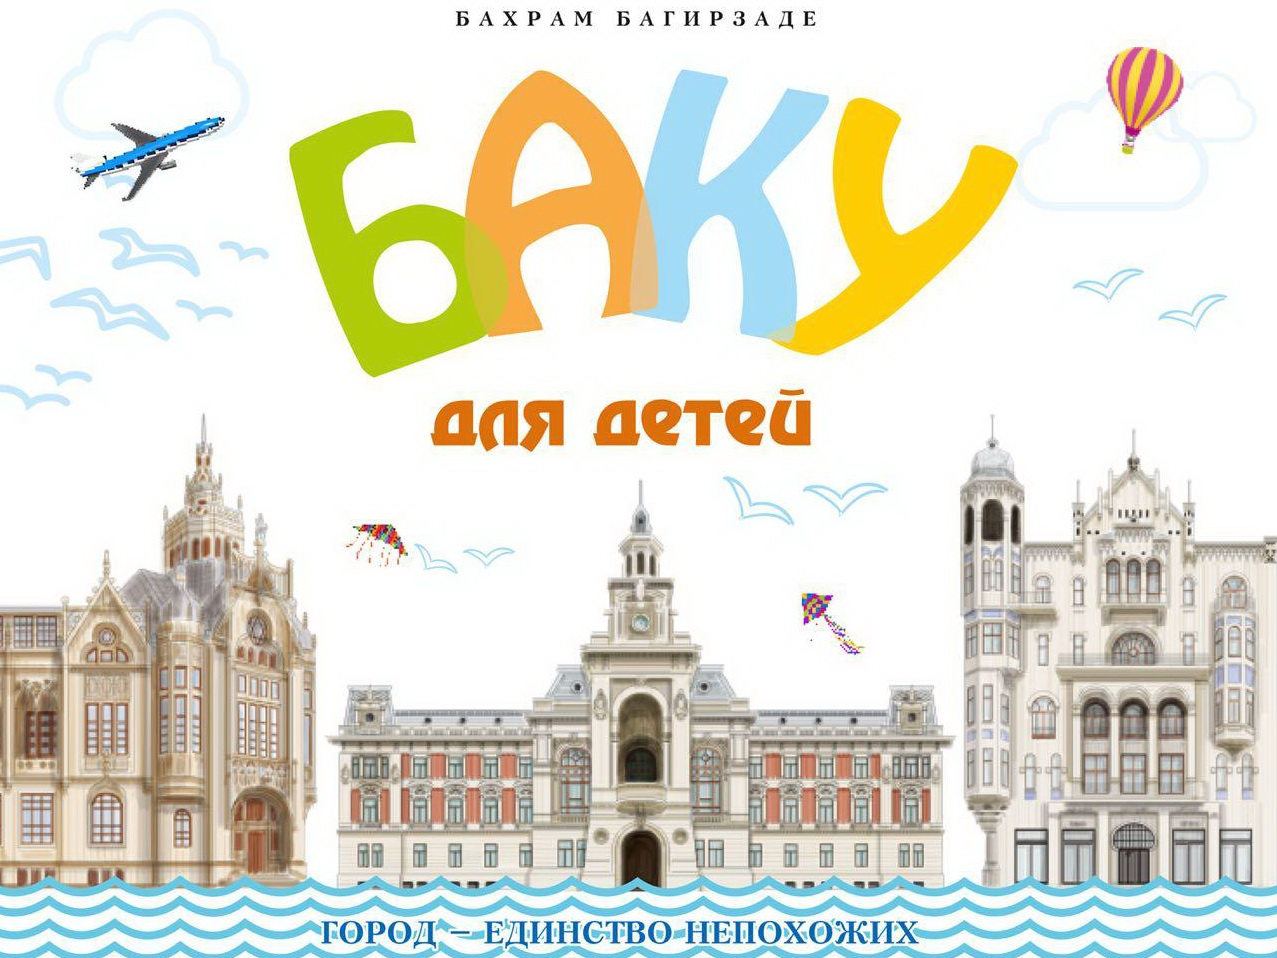 «Баку для детей»: вышла в продажу новая книга Бахрама Багирзаде – ФОТО